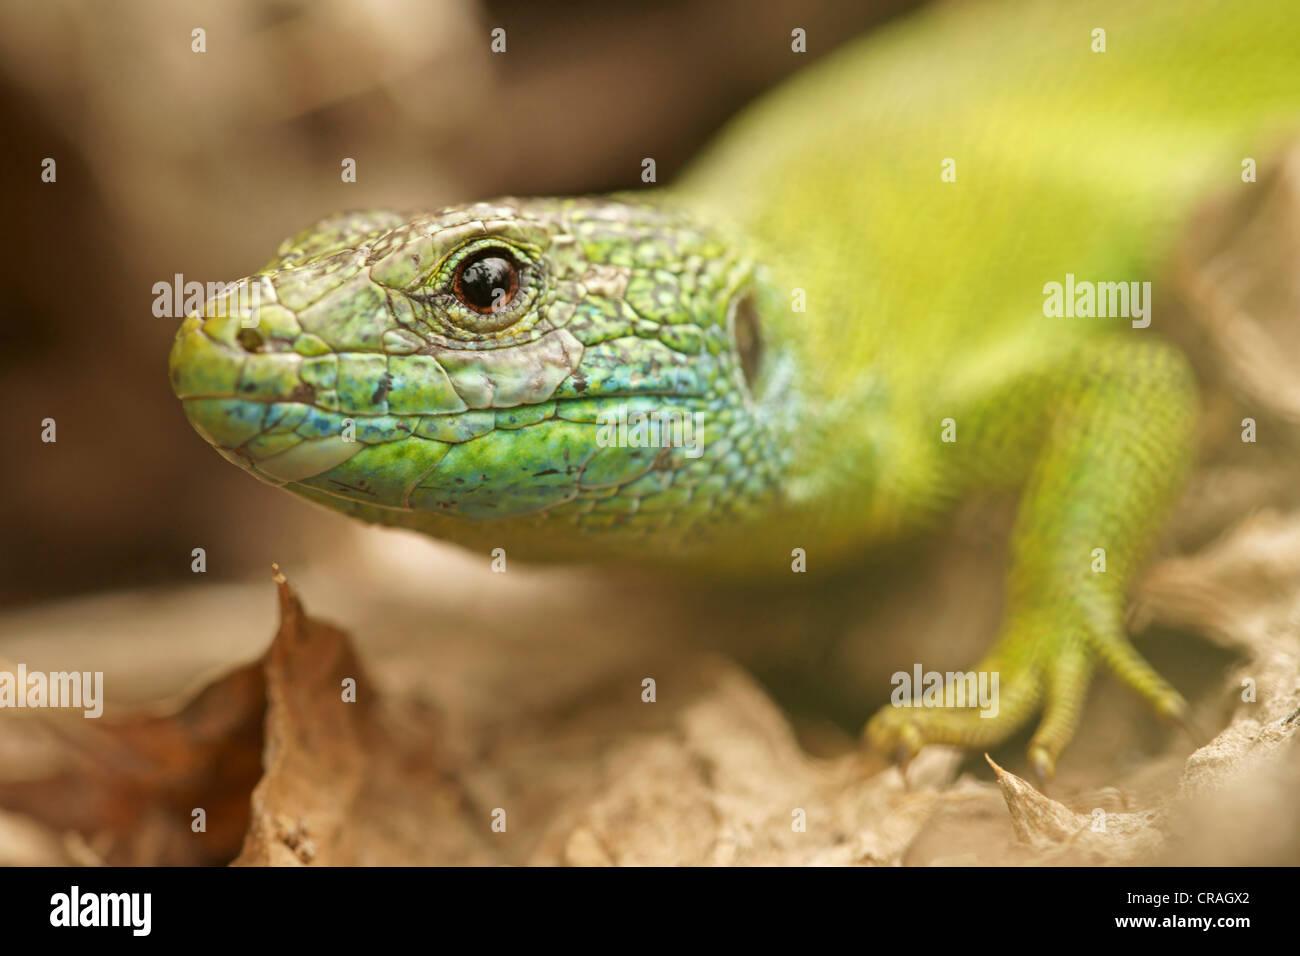 European green lizard (Lacerta viridis), Bulgaria, Europe Stock Photo